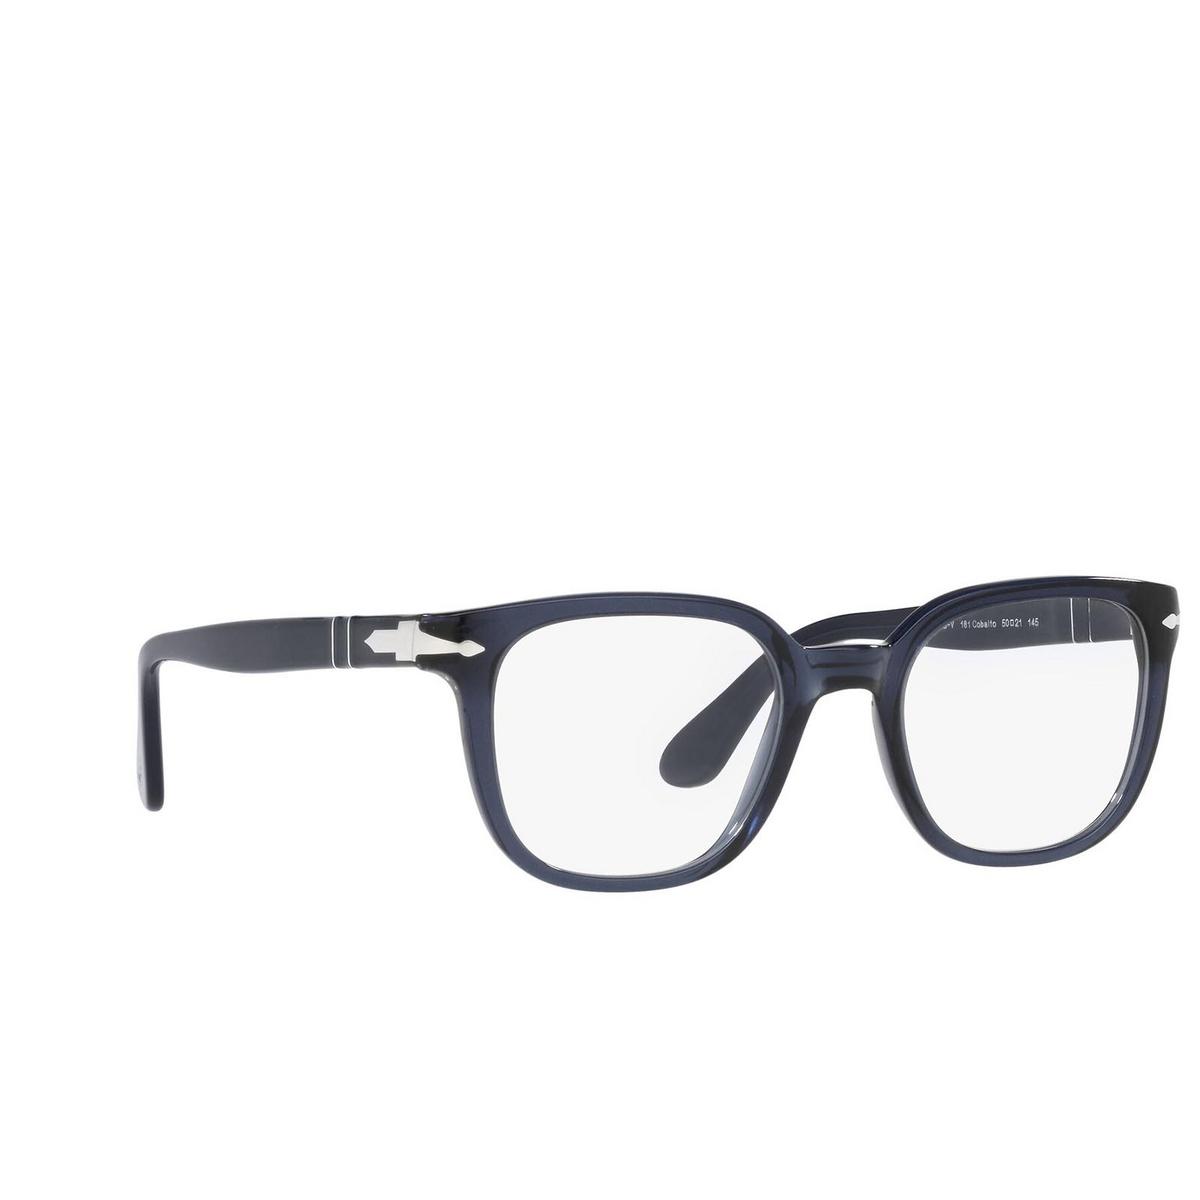 Persol® Square Eyeglasses: PO3263V color Cobalto 181 - three-quarters view.